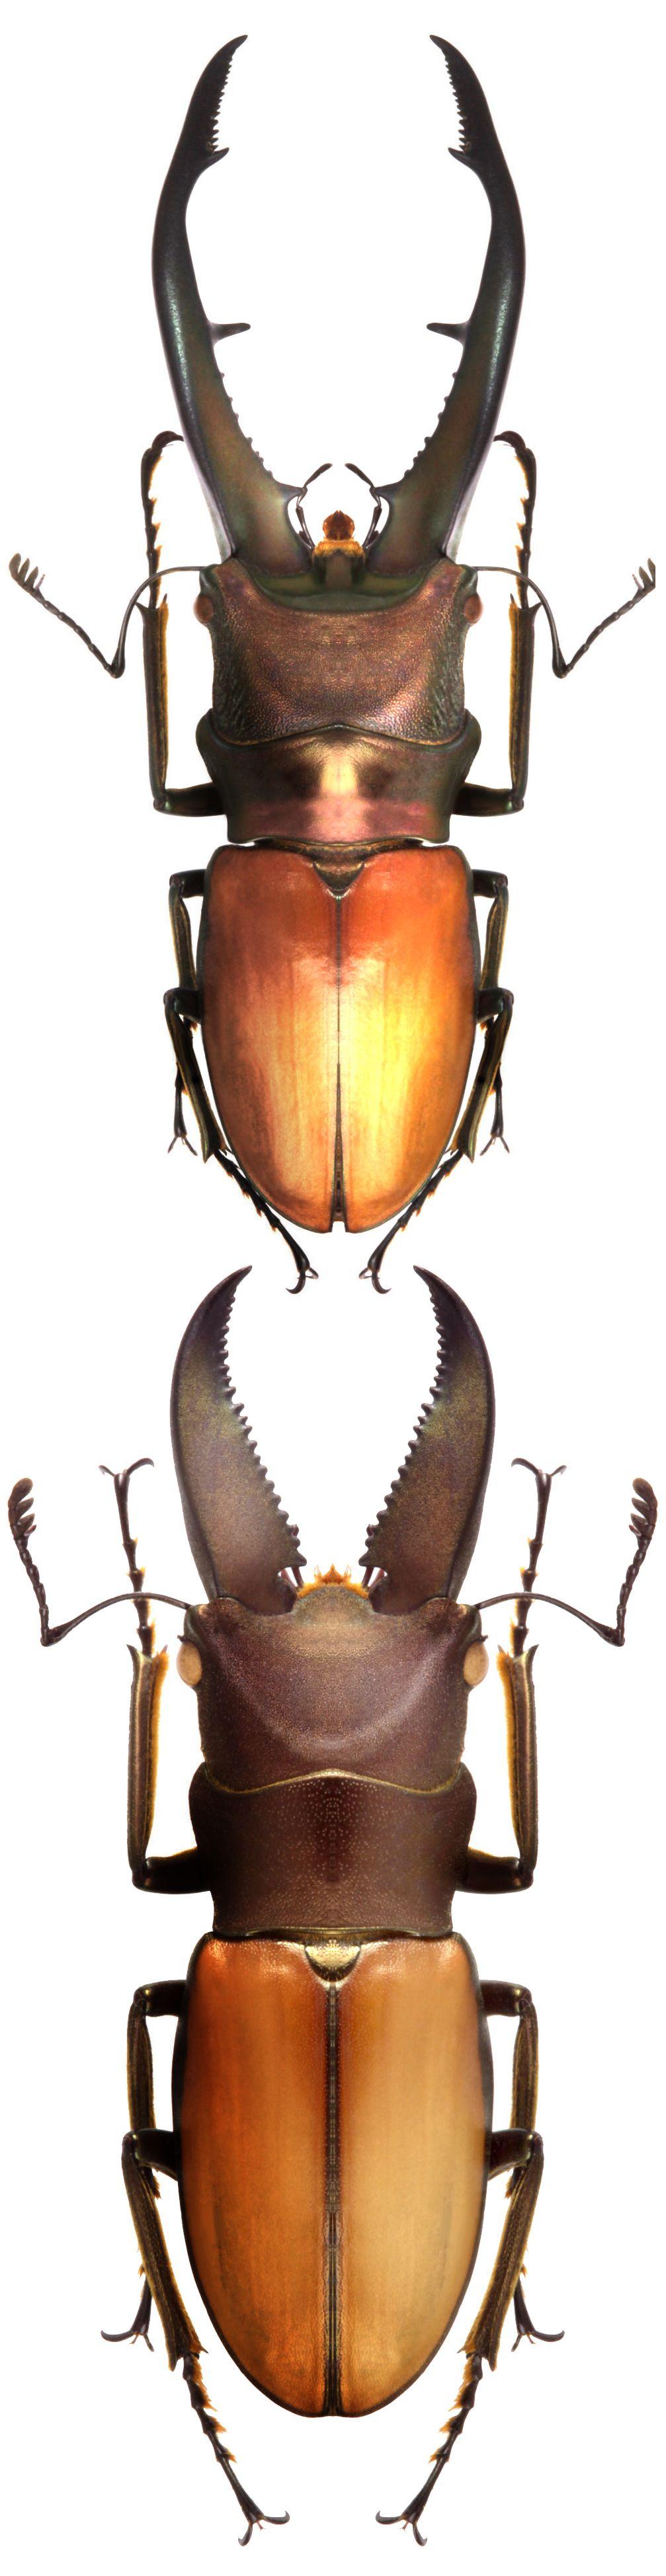 Cyclommatus montanellus